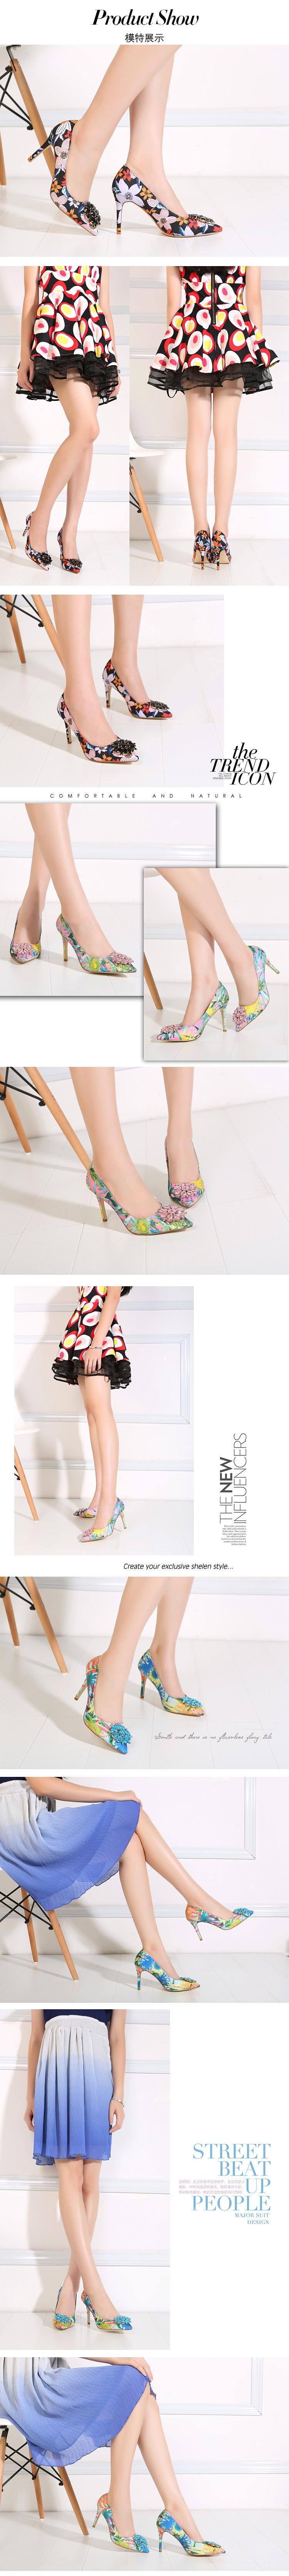 2017 Spring Fashion Pointed Women Pumps Rhinestone Thin High-heeled Women Shoes Black Pink High Heels Single Wedding Shoes XP35 2